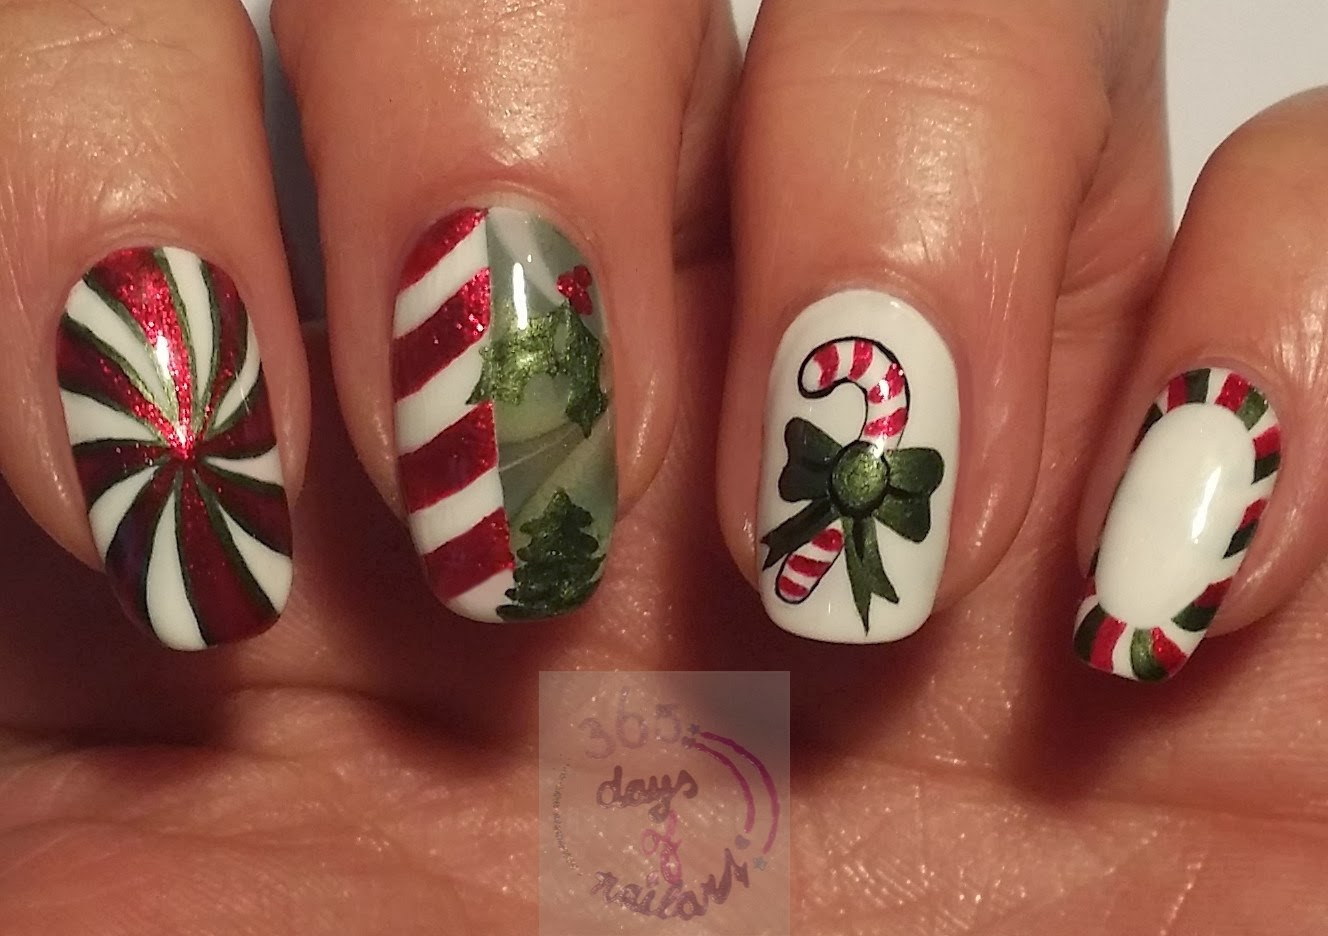 Candy Cane Stripes 3d Christmas Tree Nail Art: 365+ Days Of Nail Art: Day 339) Candy Stripe Nail Art